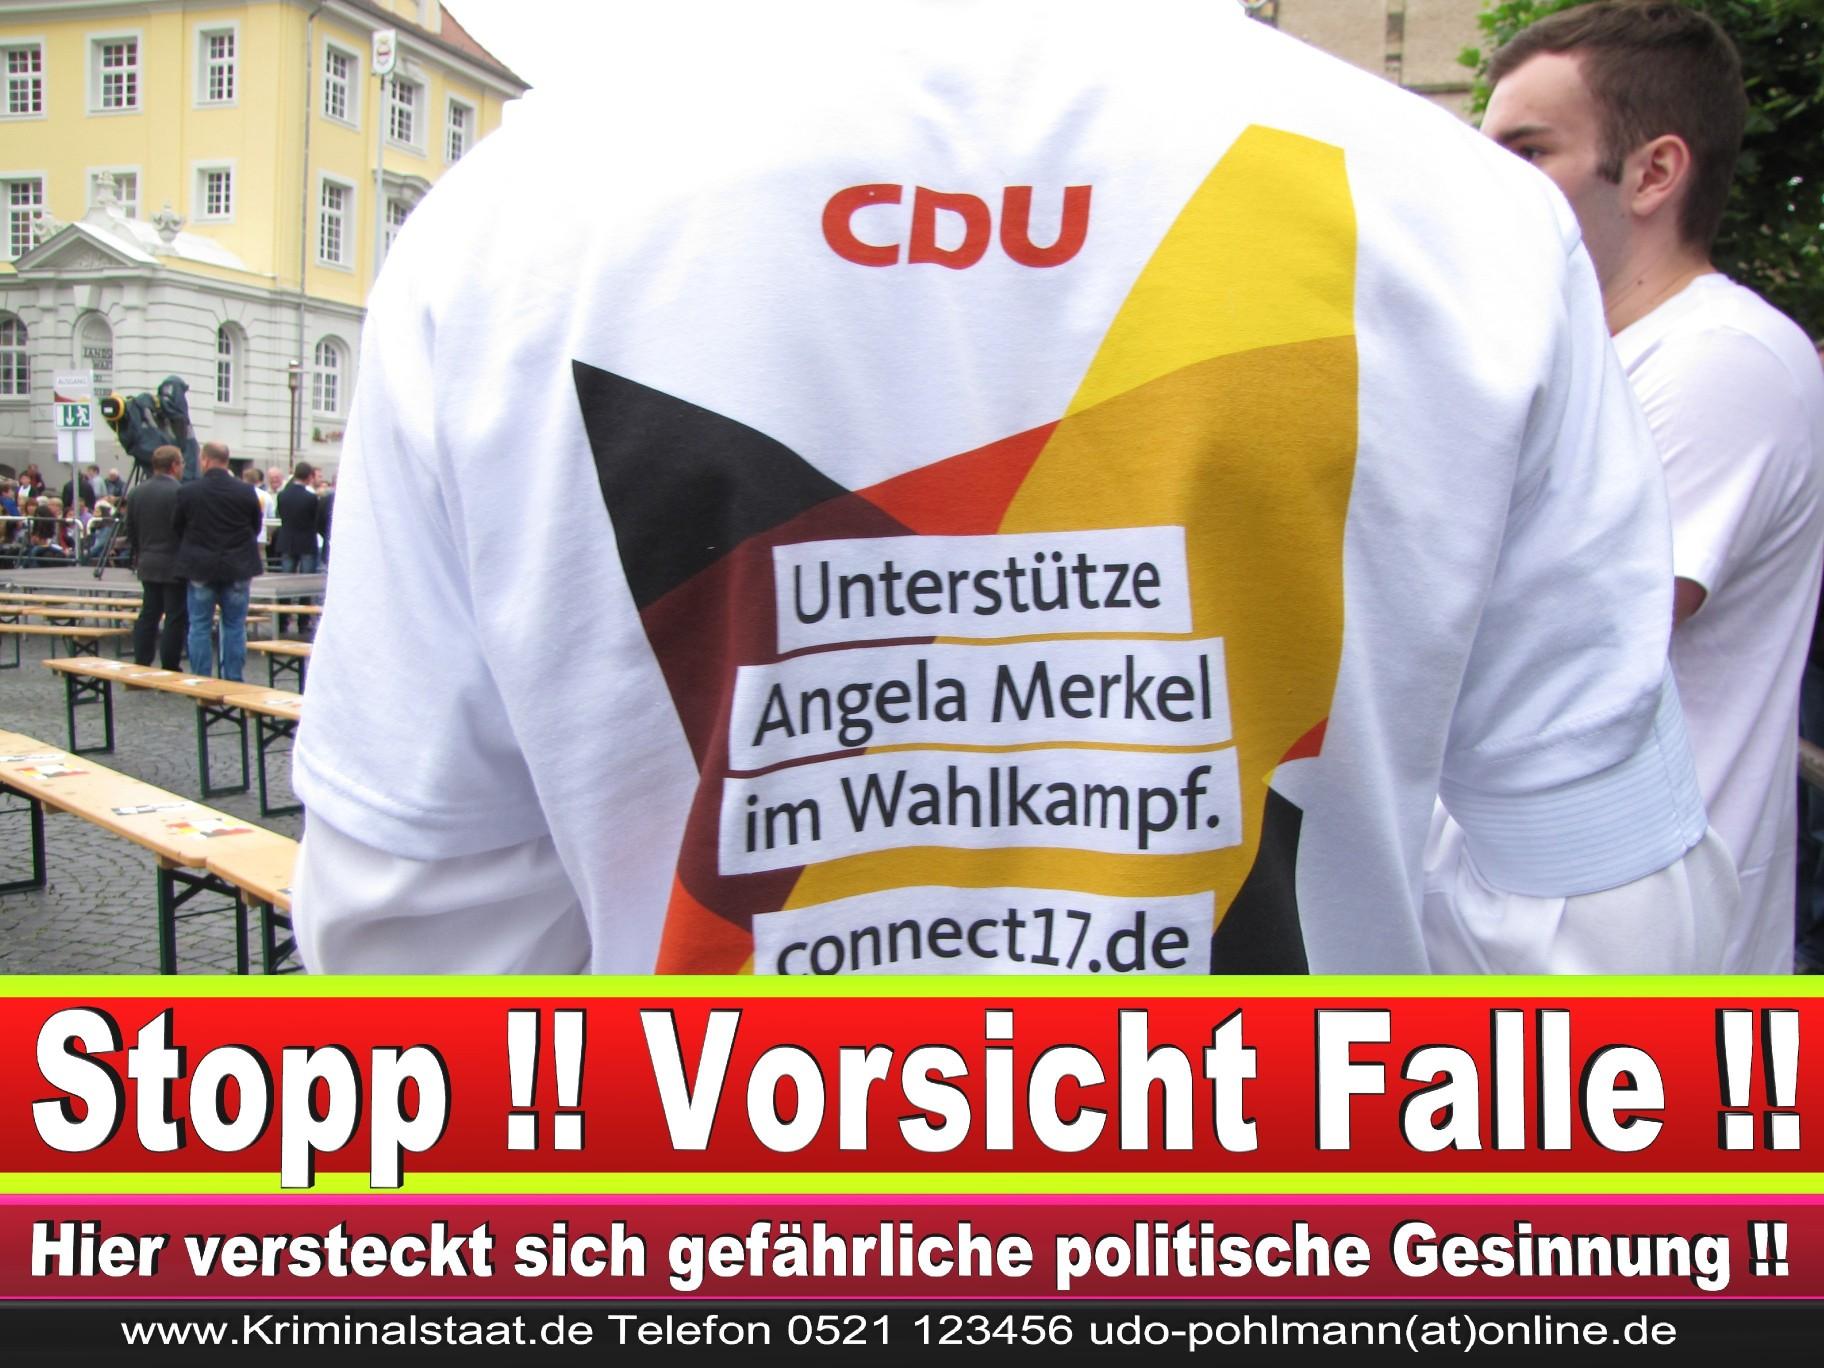 CDU HERFORD Kurruption Betrug Kinderpornografie Kinderpornos 17